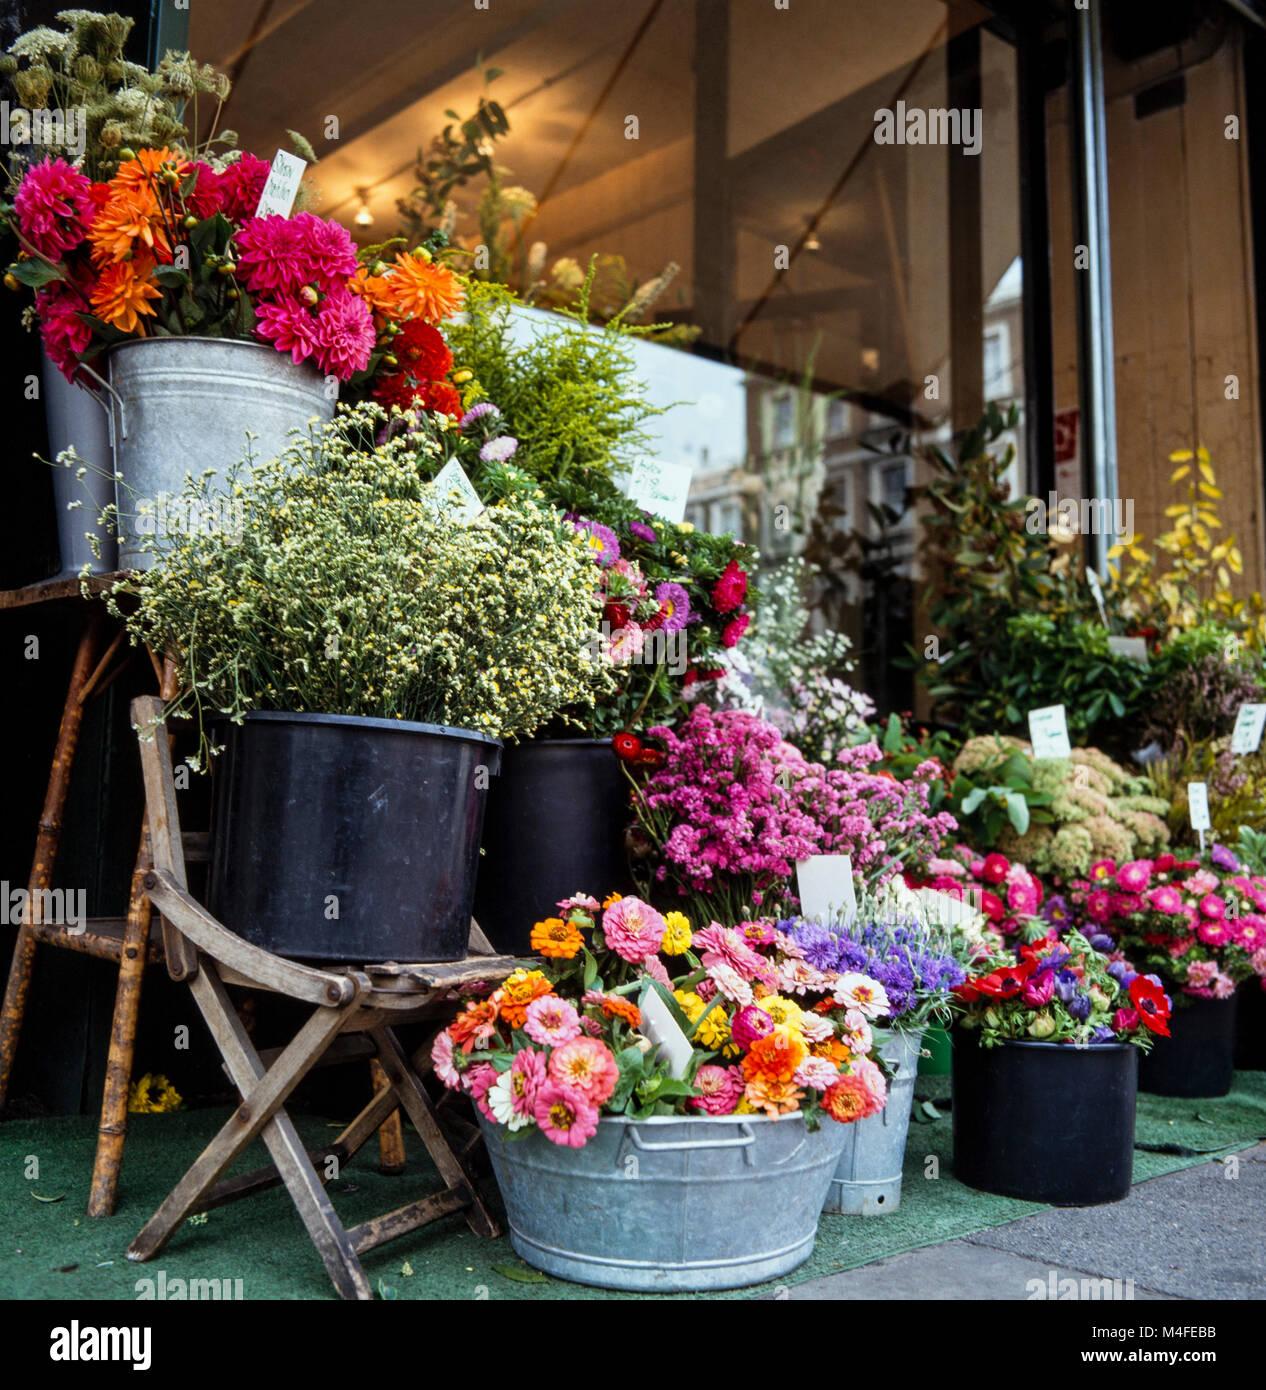 Floral Shops Stock Photos Floral Shops Stock Images Alamy